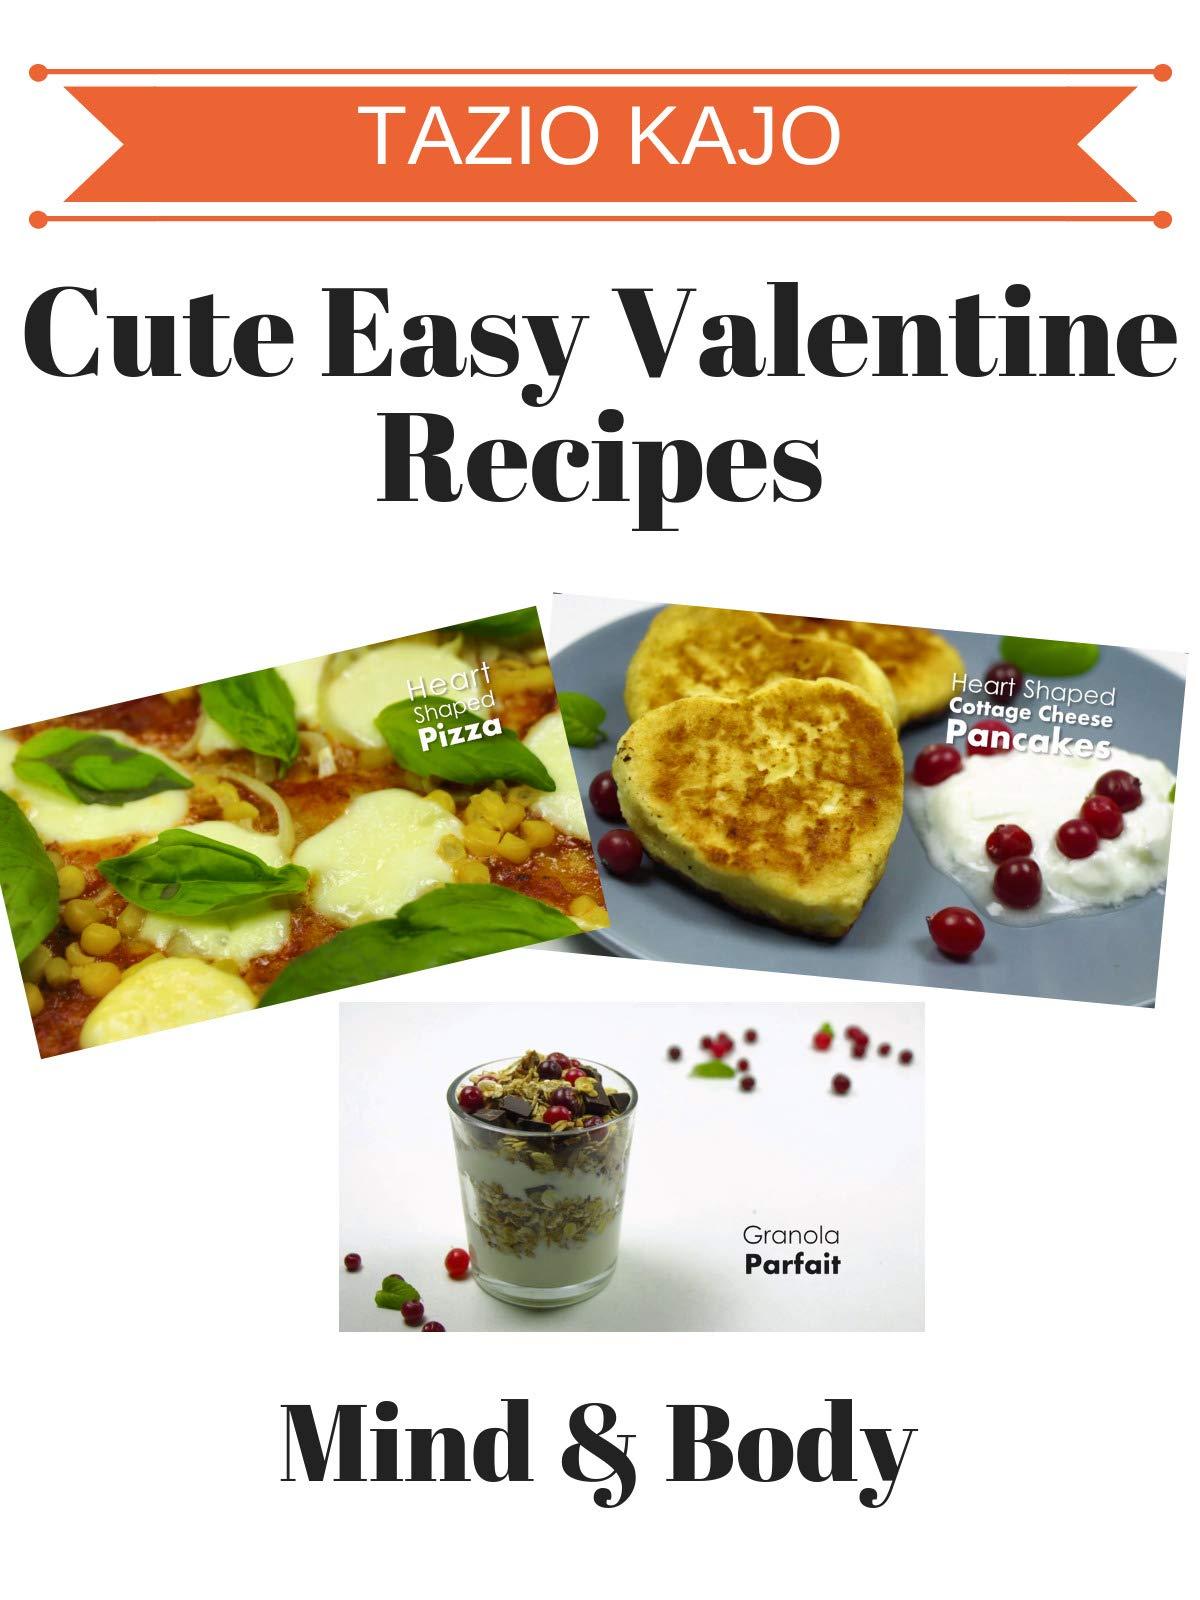 Cute Easy Valentine's Recipes